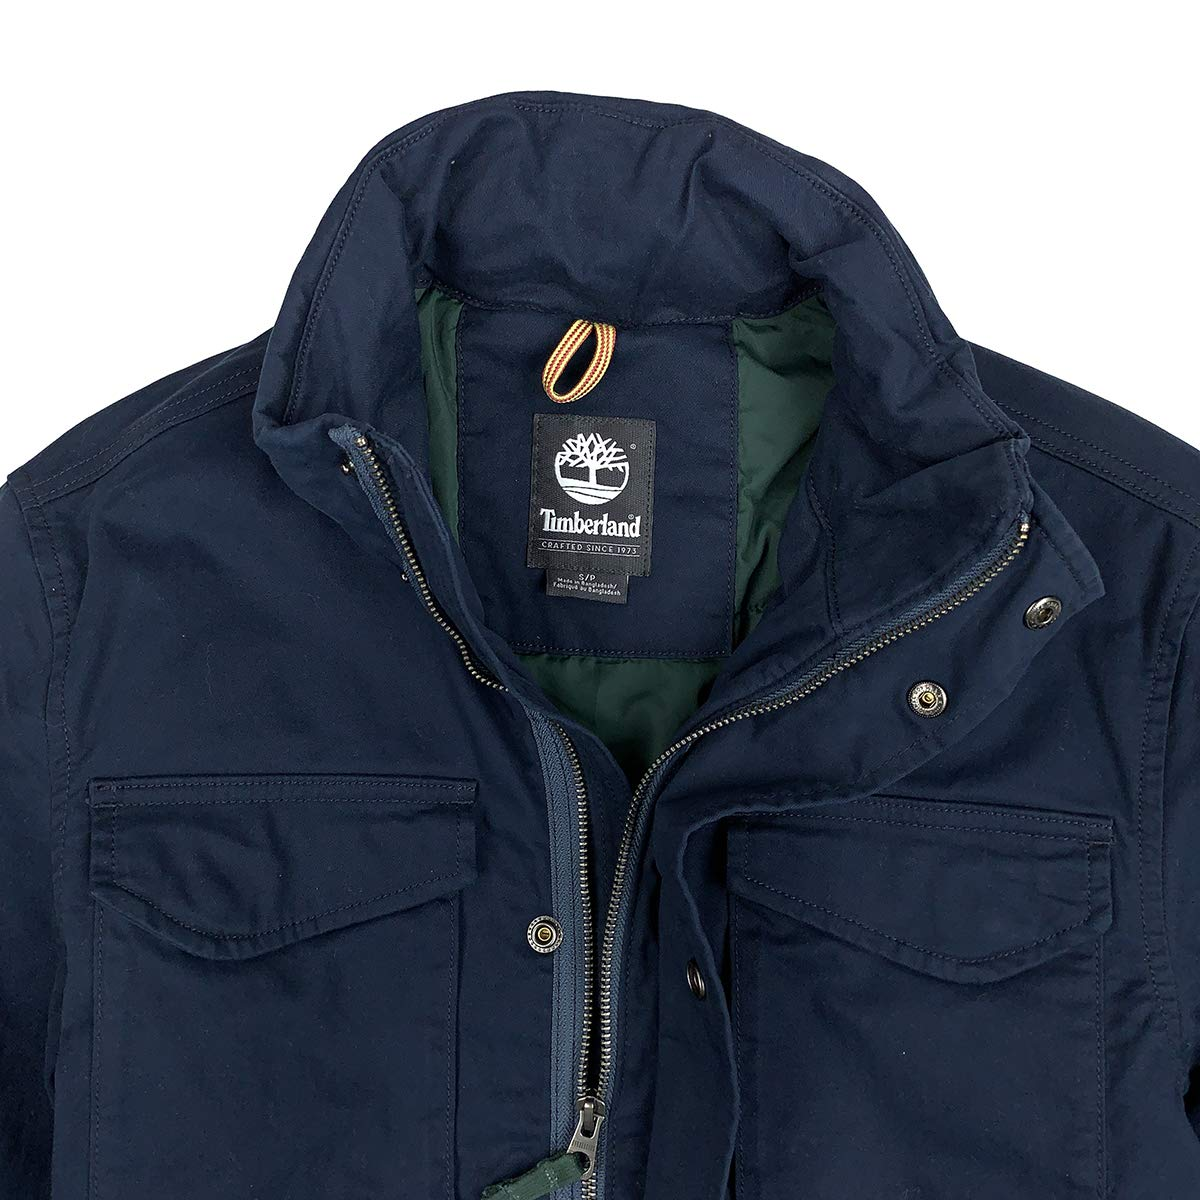 Timberland Men's MT. Kelsey M65 Canvas Jacket at Amazon